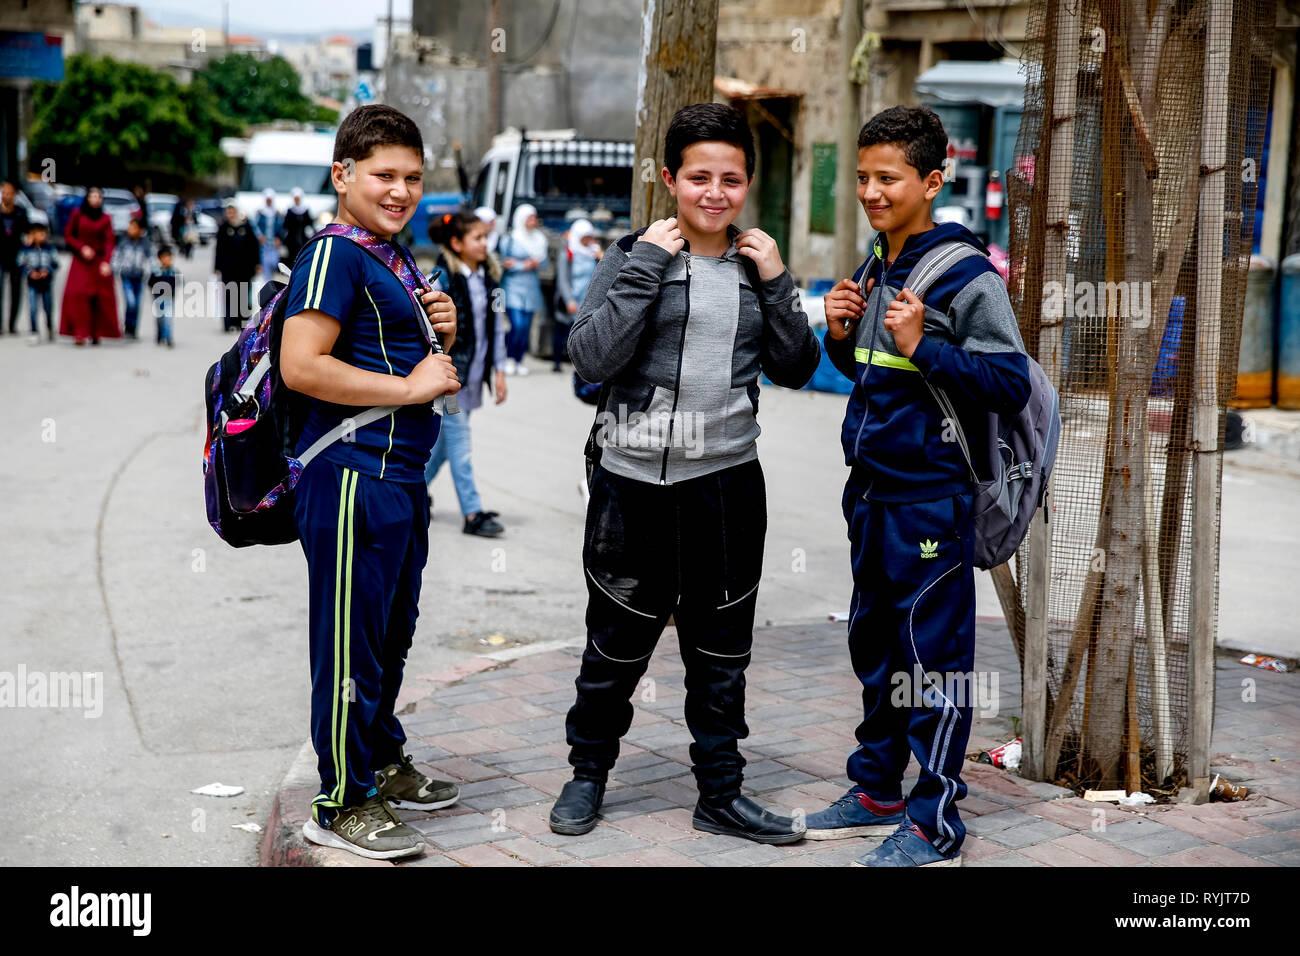 Palestinian schoolchildren standing in a street of Beit Furik, West Bank, palestine. - Stock Image